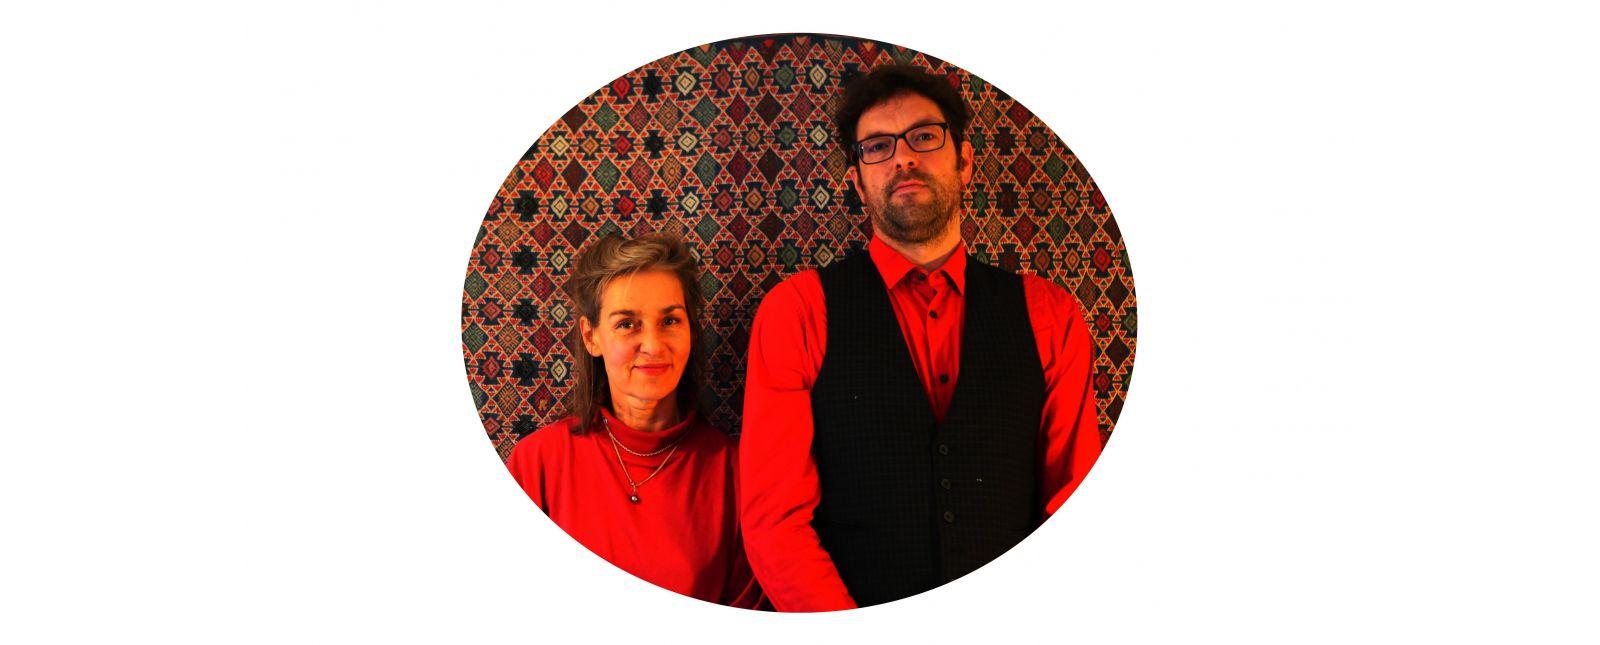 Dorothea Gädeke  & Konrad Wiemann //  Dorothea handl / 2018